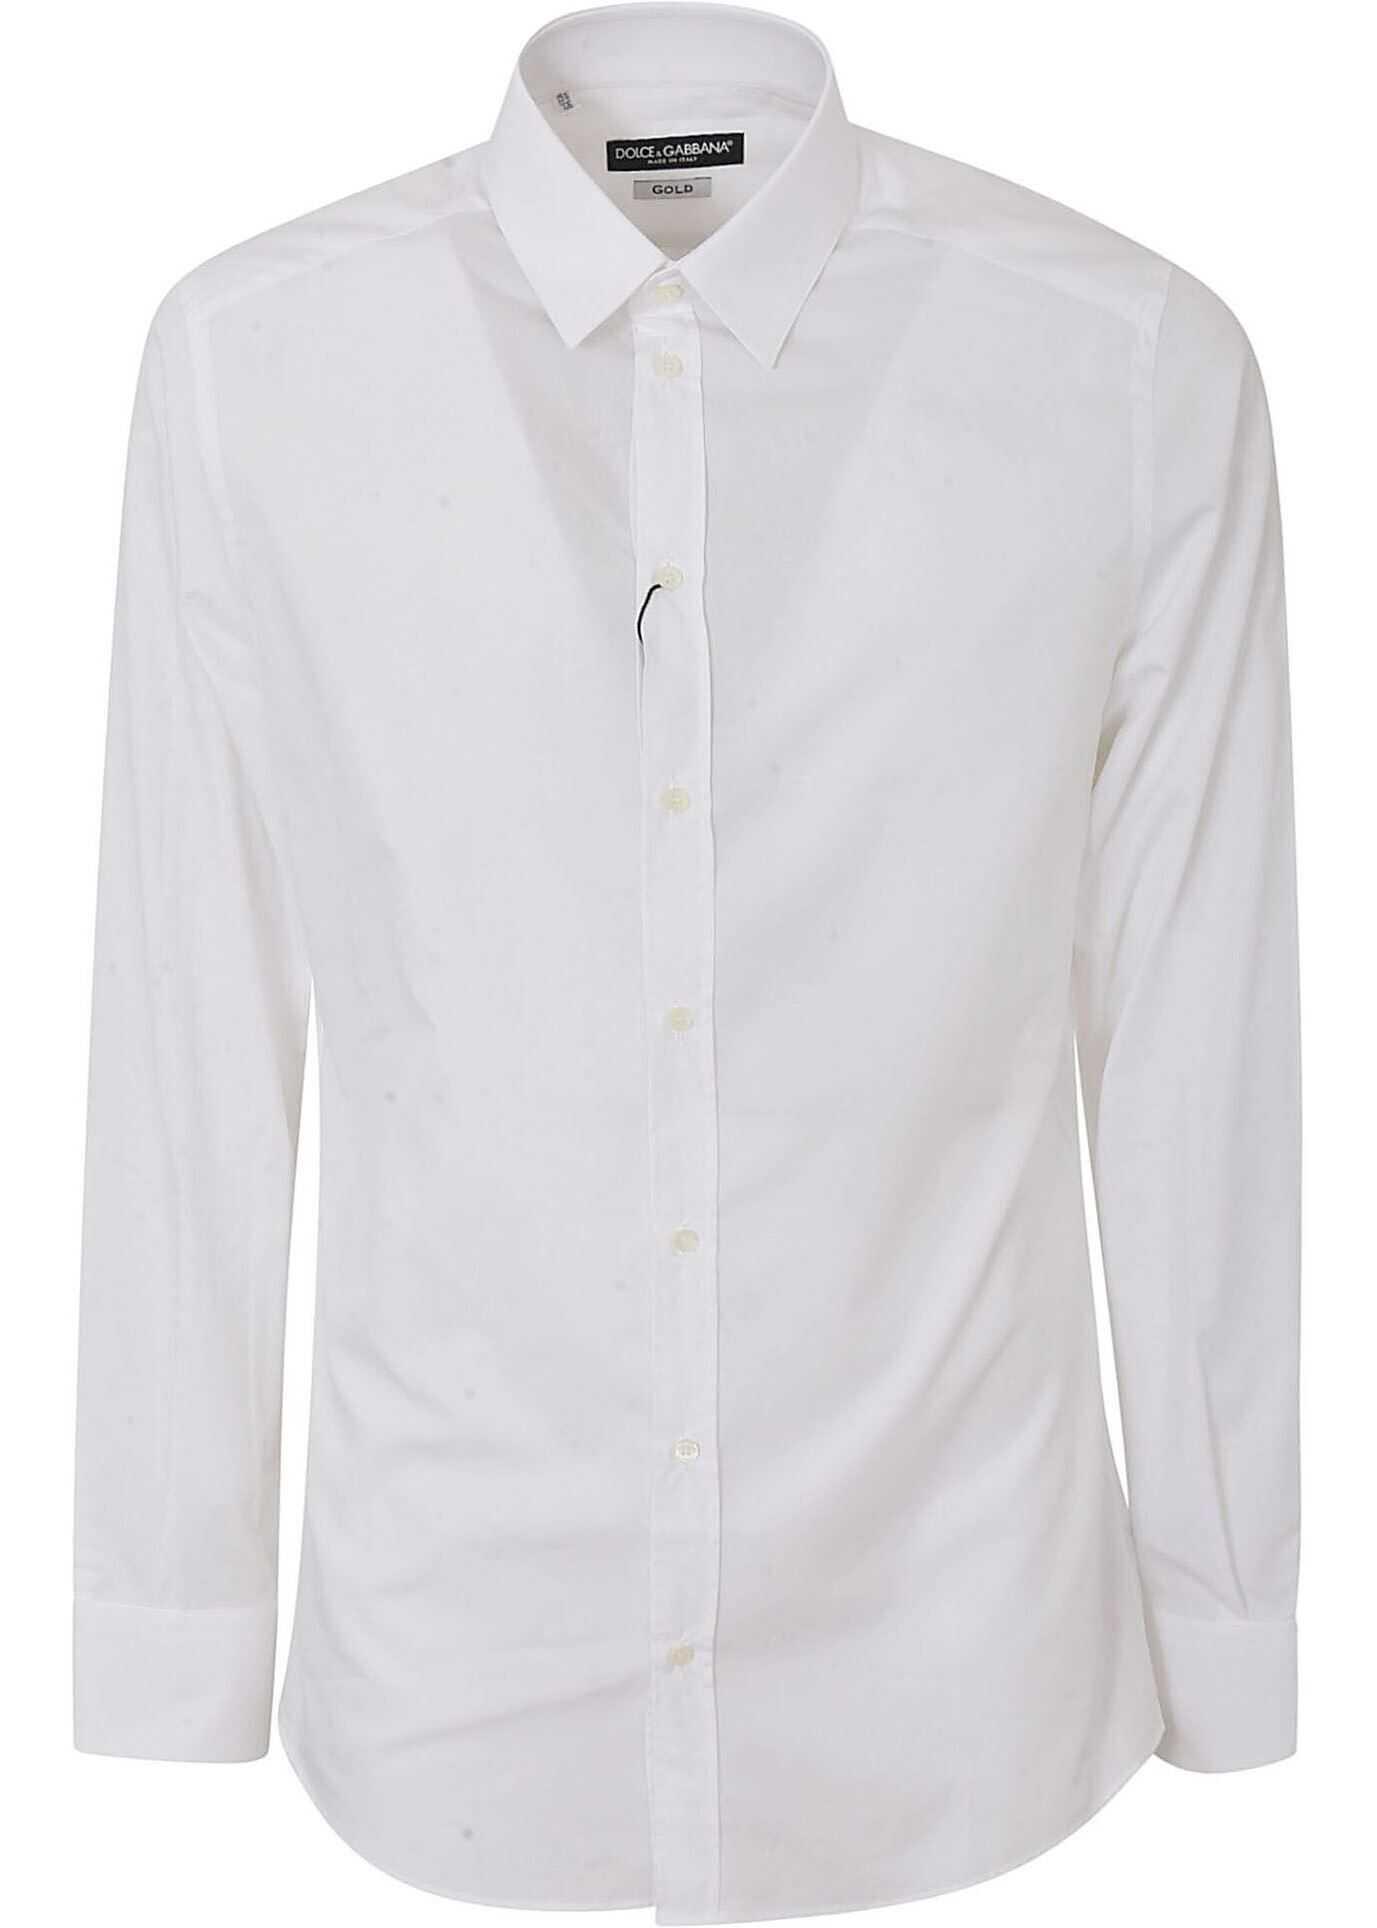 Dolce & Gabbana Classic Shirt In White White imagine